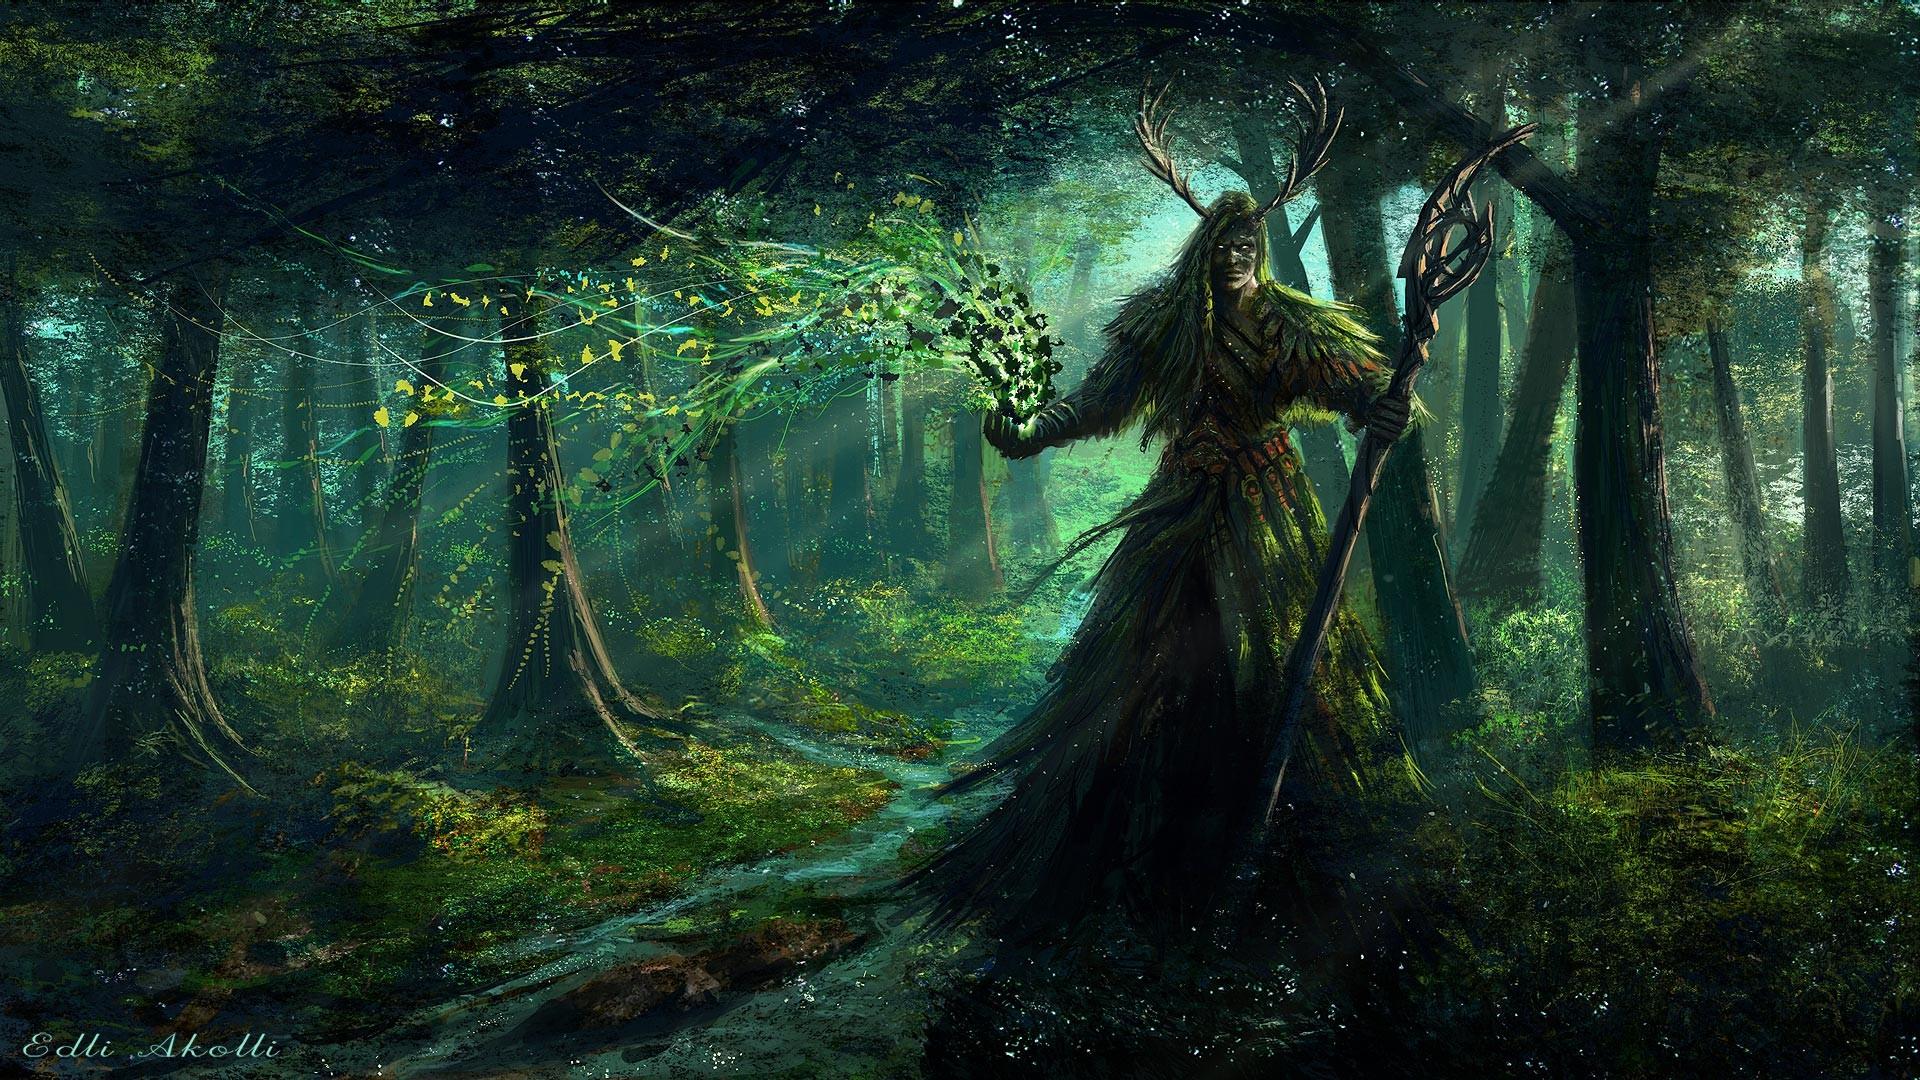 … World Of Warcraft Wallpaper Druid (05) …